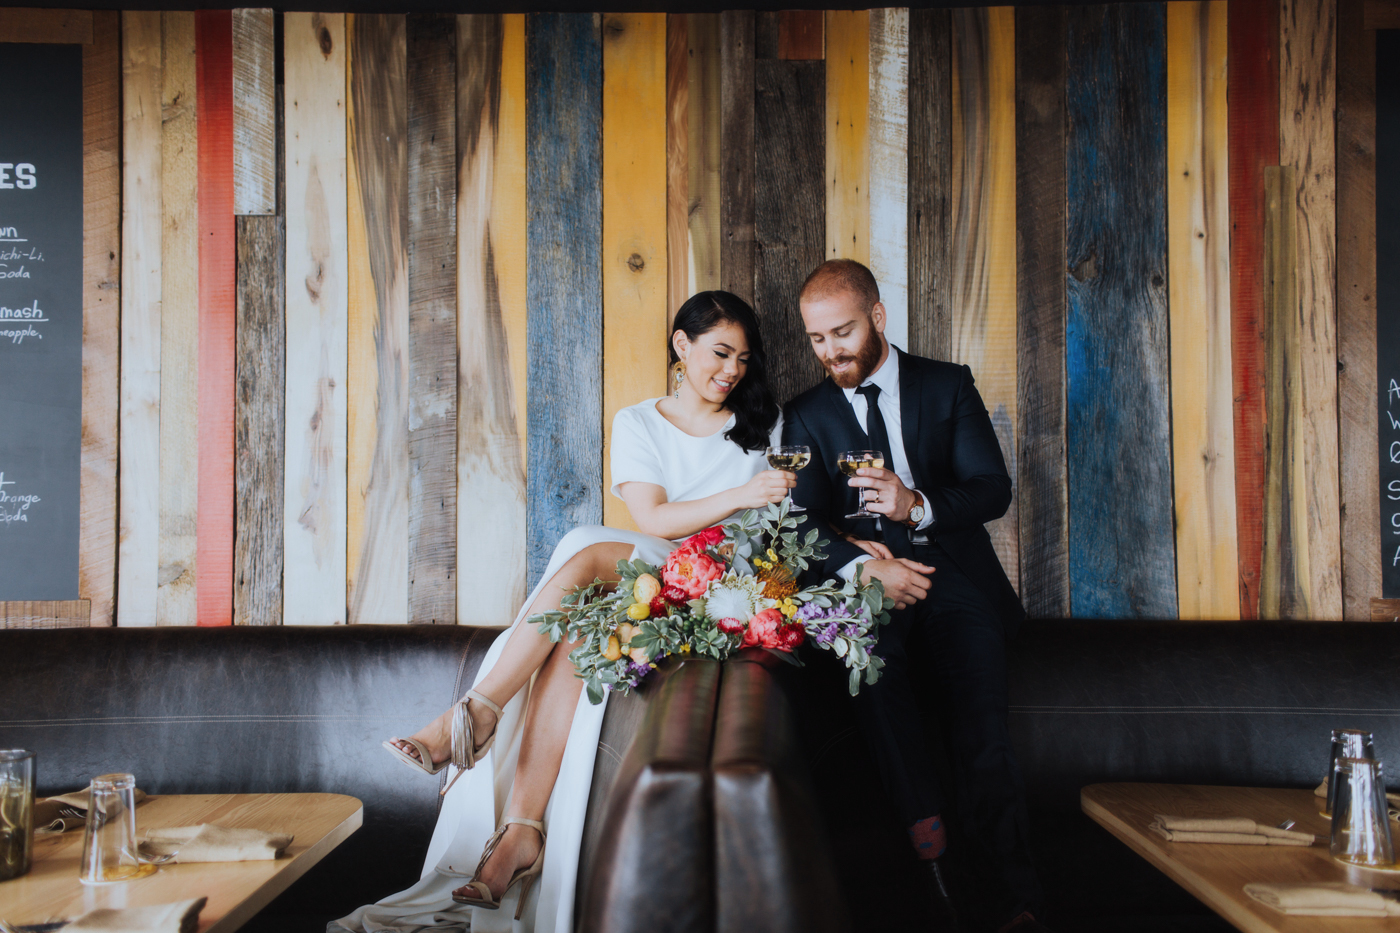 Wedding | Canvas Market | Lake Nona-Orlando, FL  | Vanessa Boy Photography | vanessaboy.com-235.com |Green Wedding Shoes.jpg